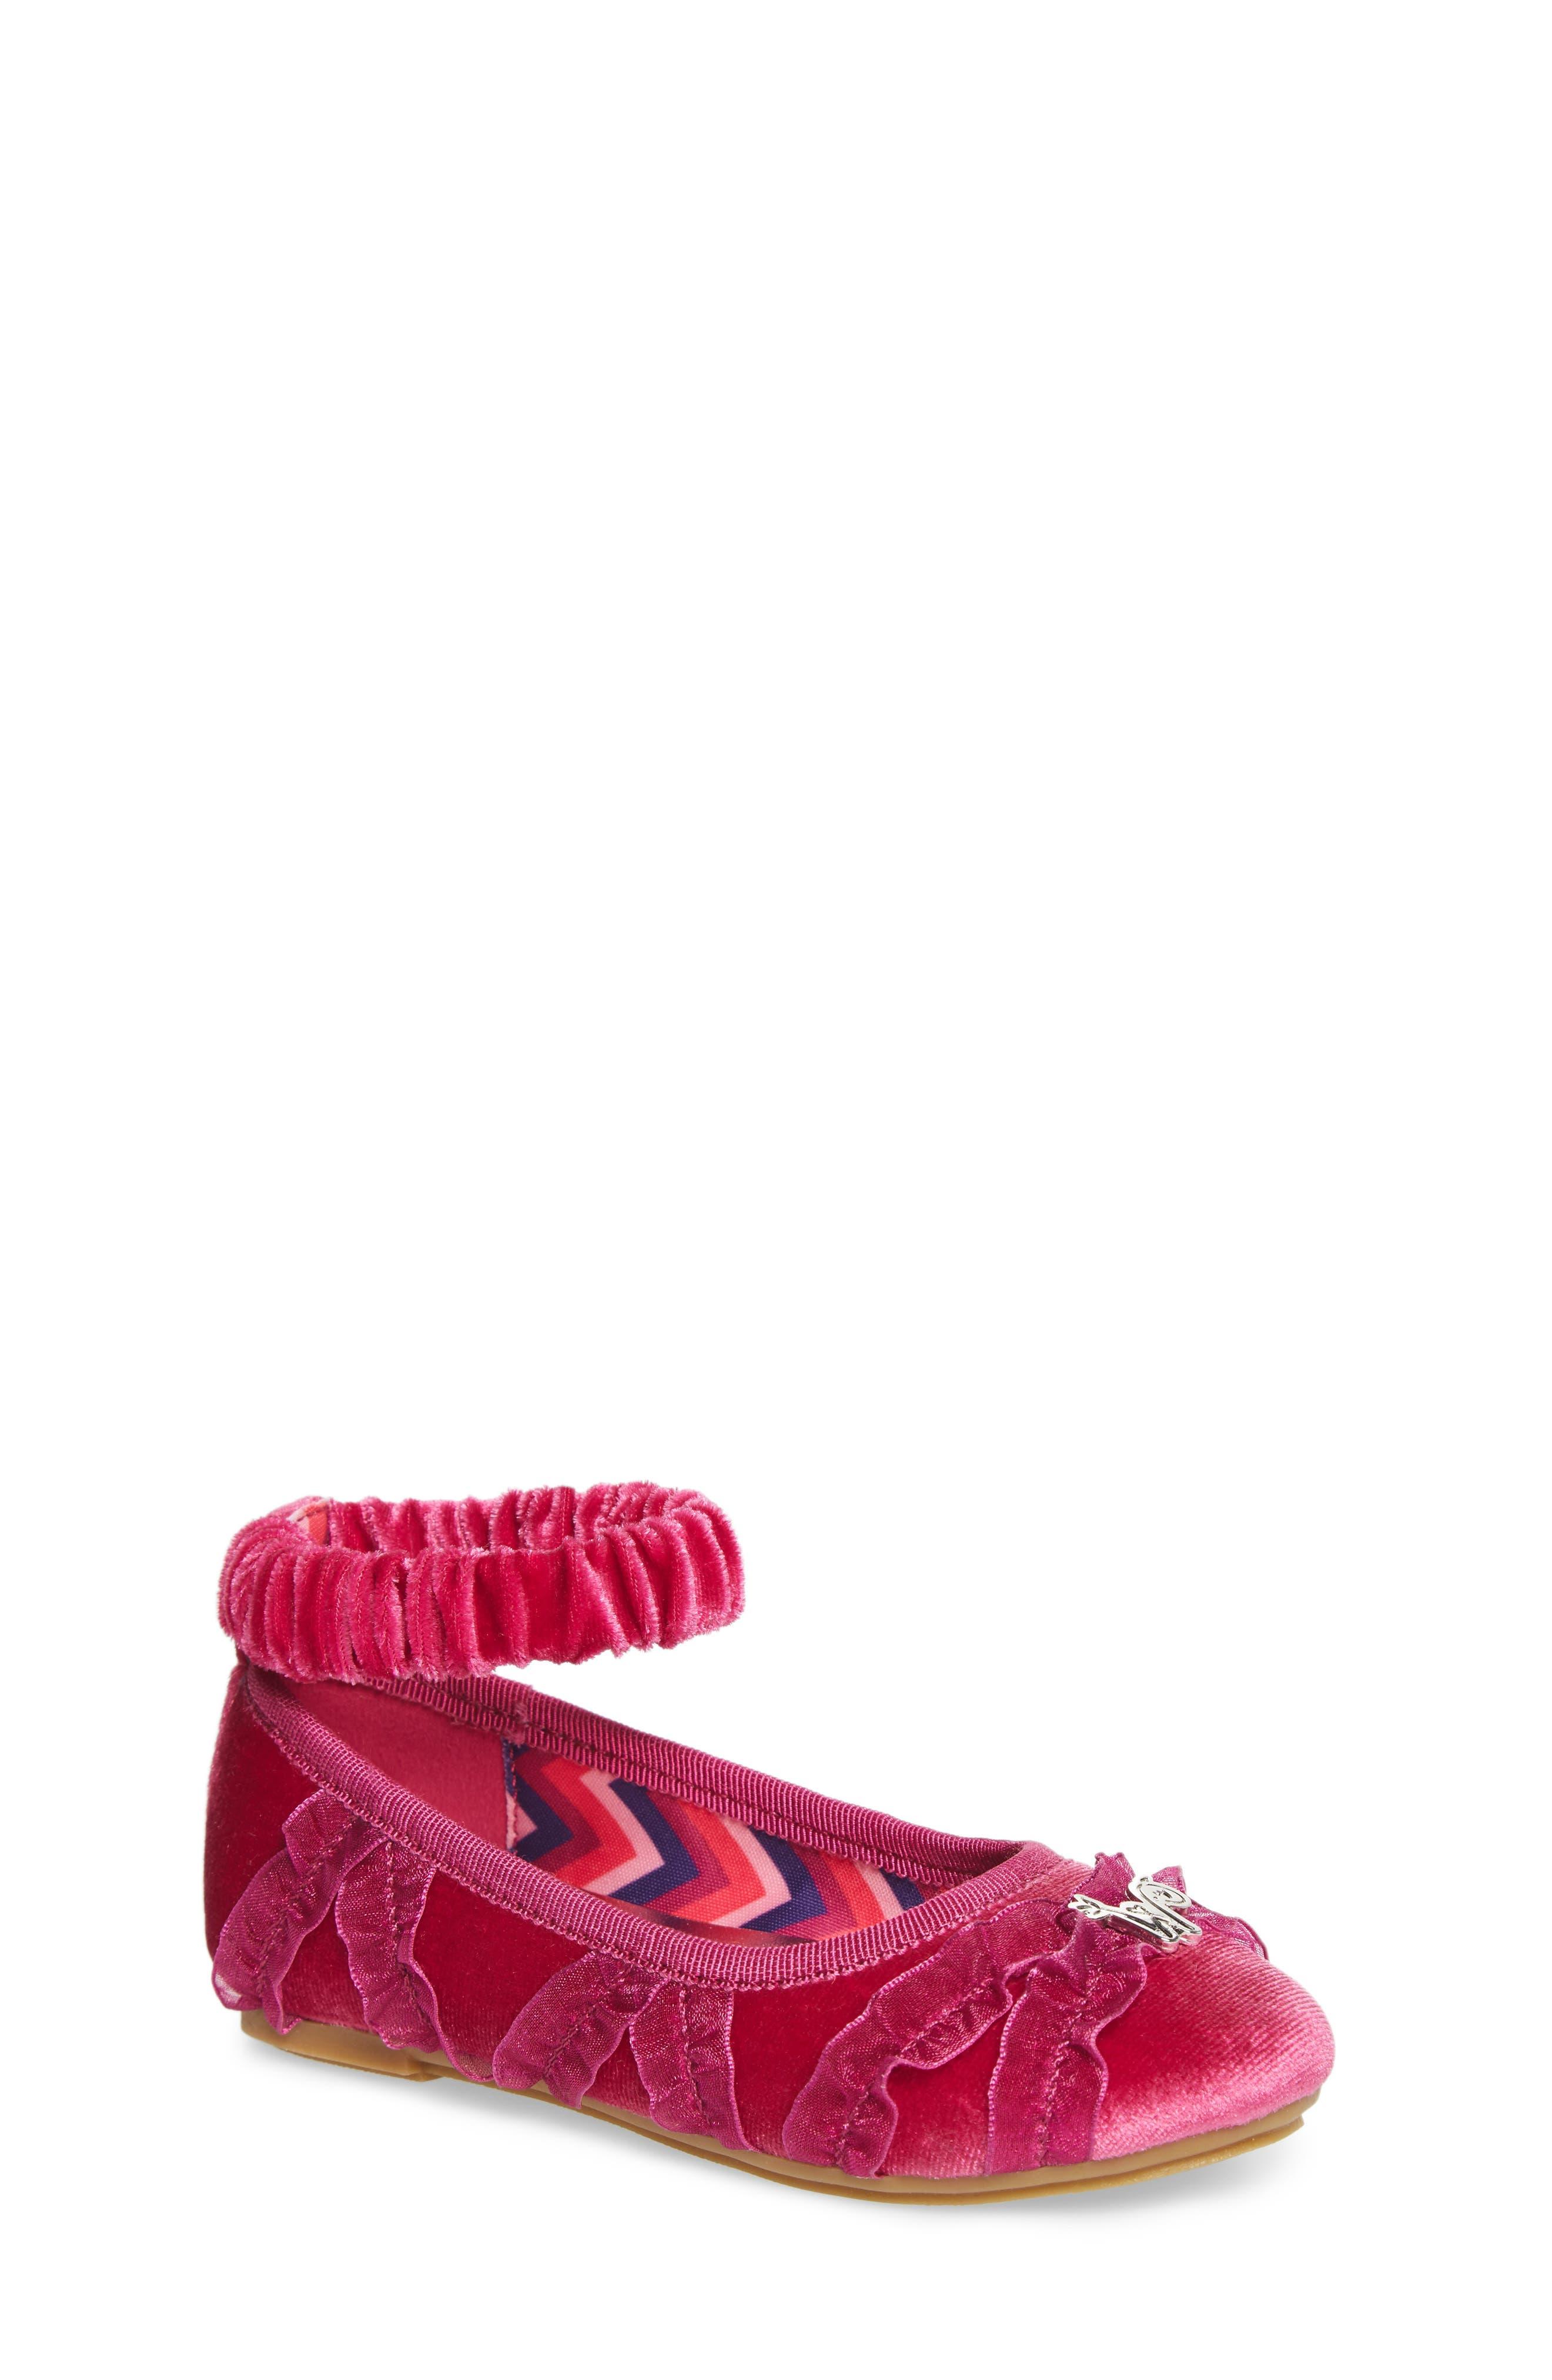 WellieWishers from American Girl Emerson Ankle Strap Ballet Flat (Walker, Toddler, Little Kid & Big Kid)